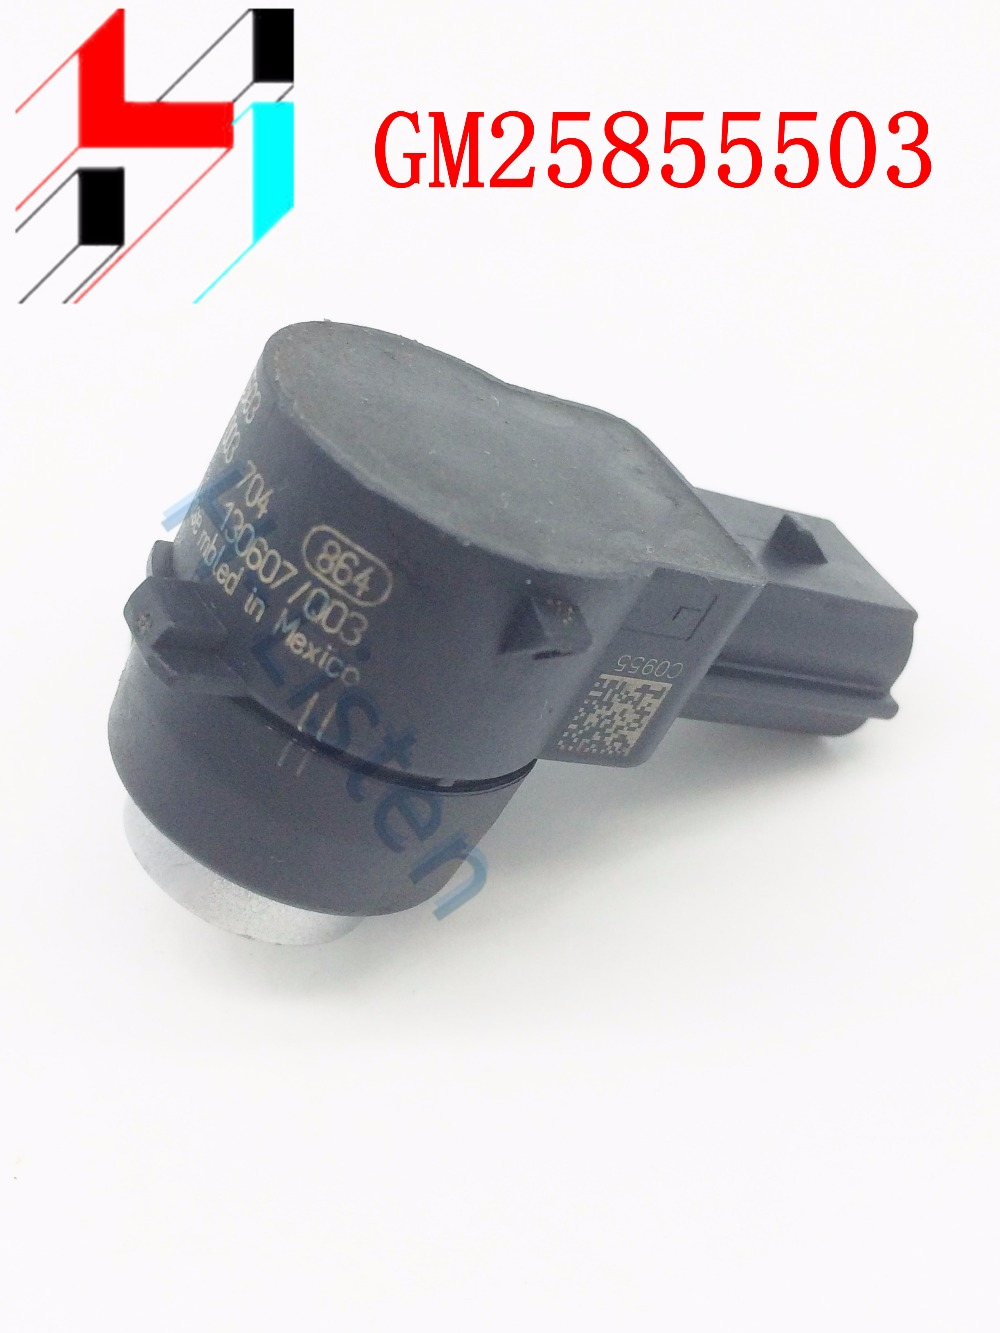 25855503 Original Parking PDC Ultrasonic Sensor Reverse Assist For G M C Ruze O Pel C Adillac OE#0263003704